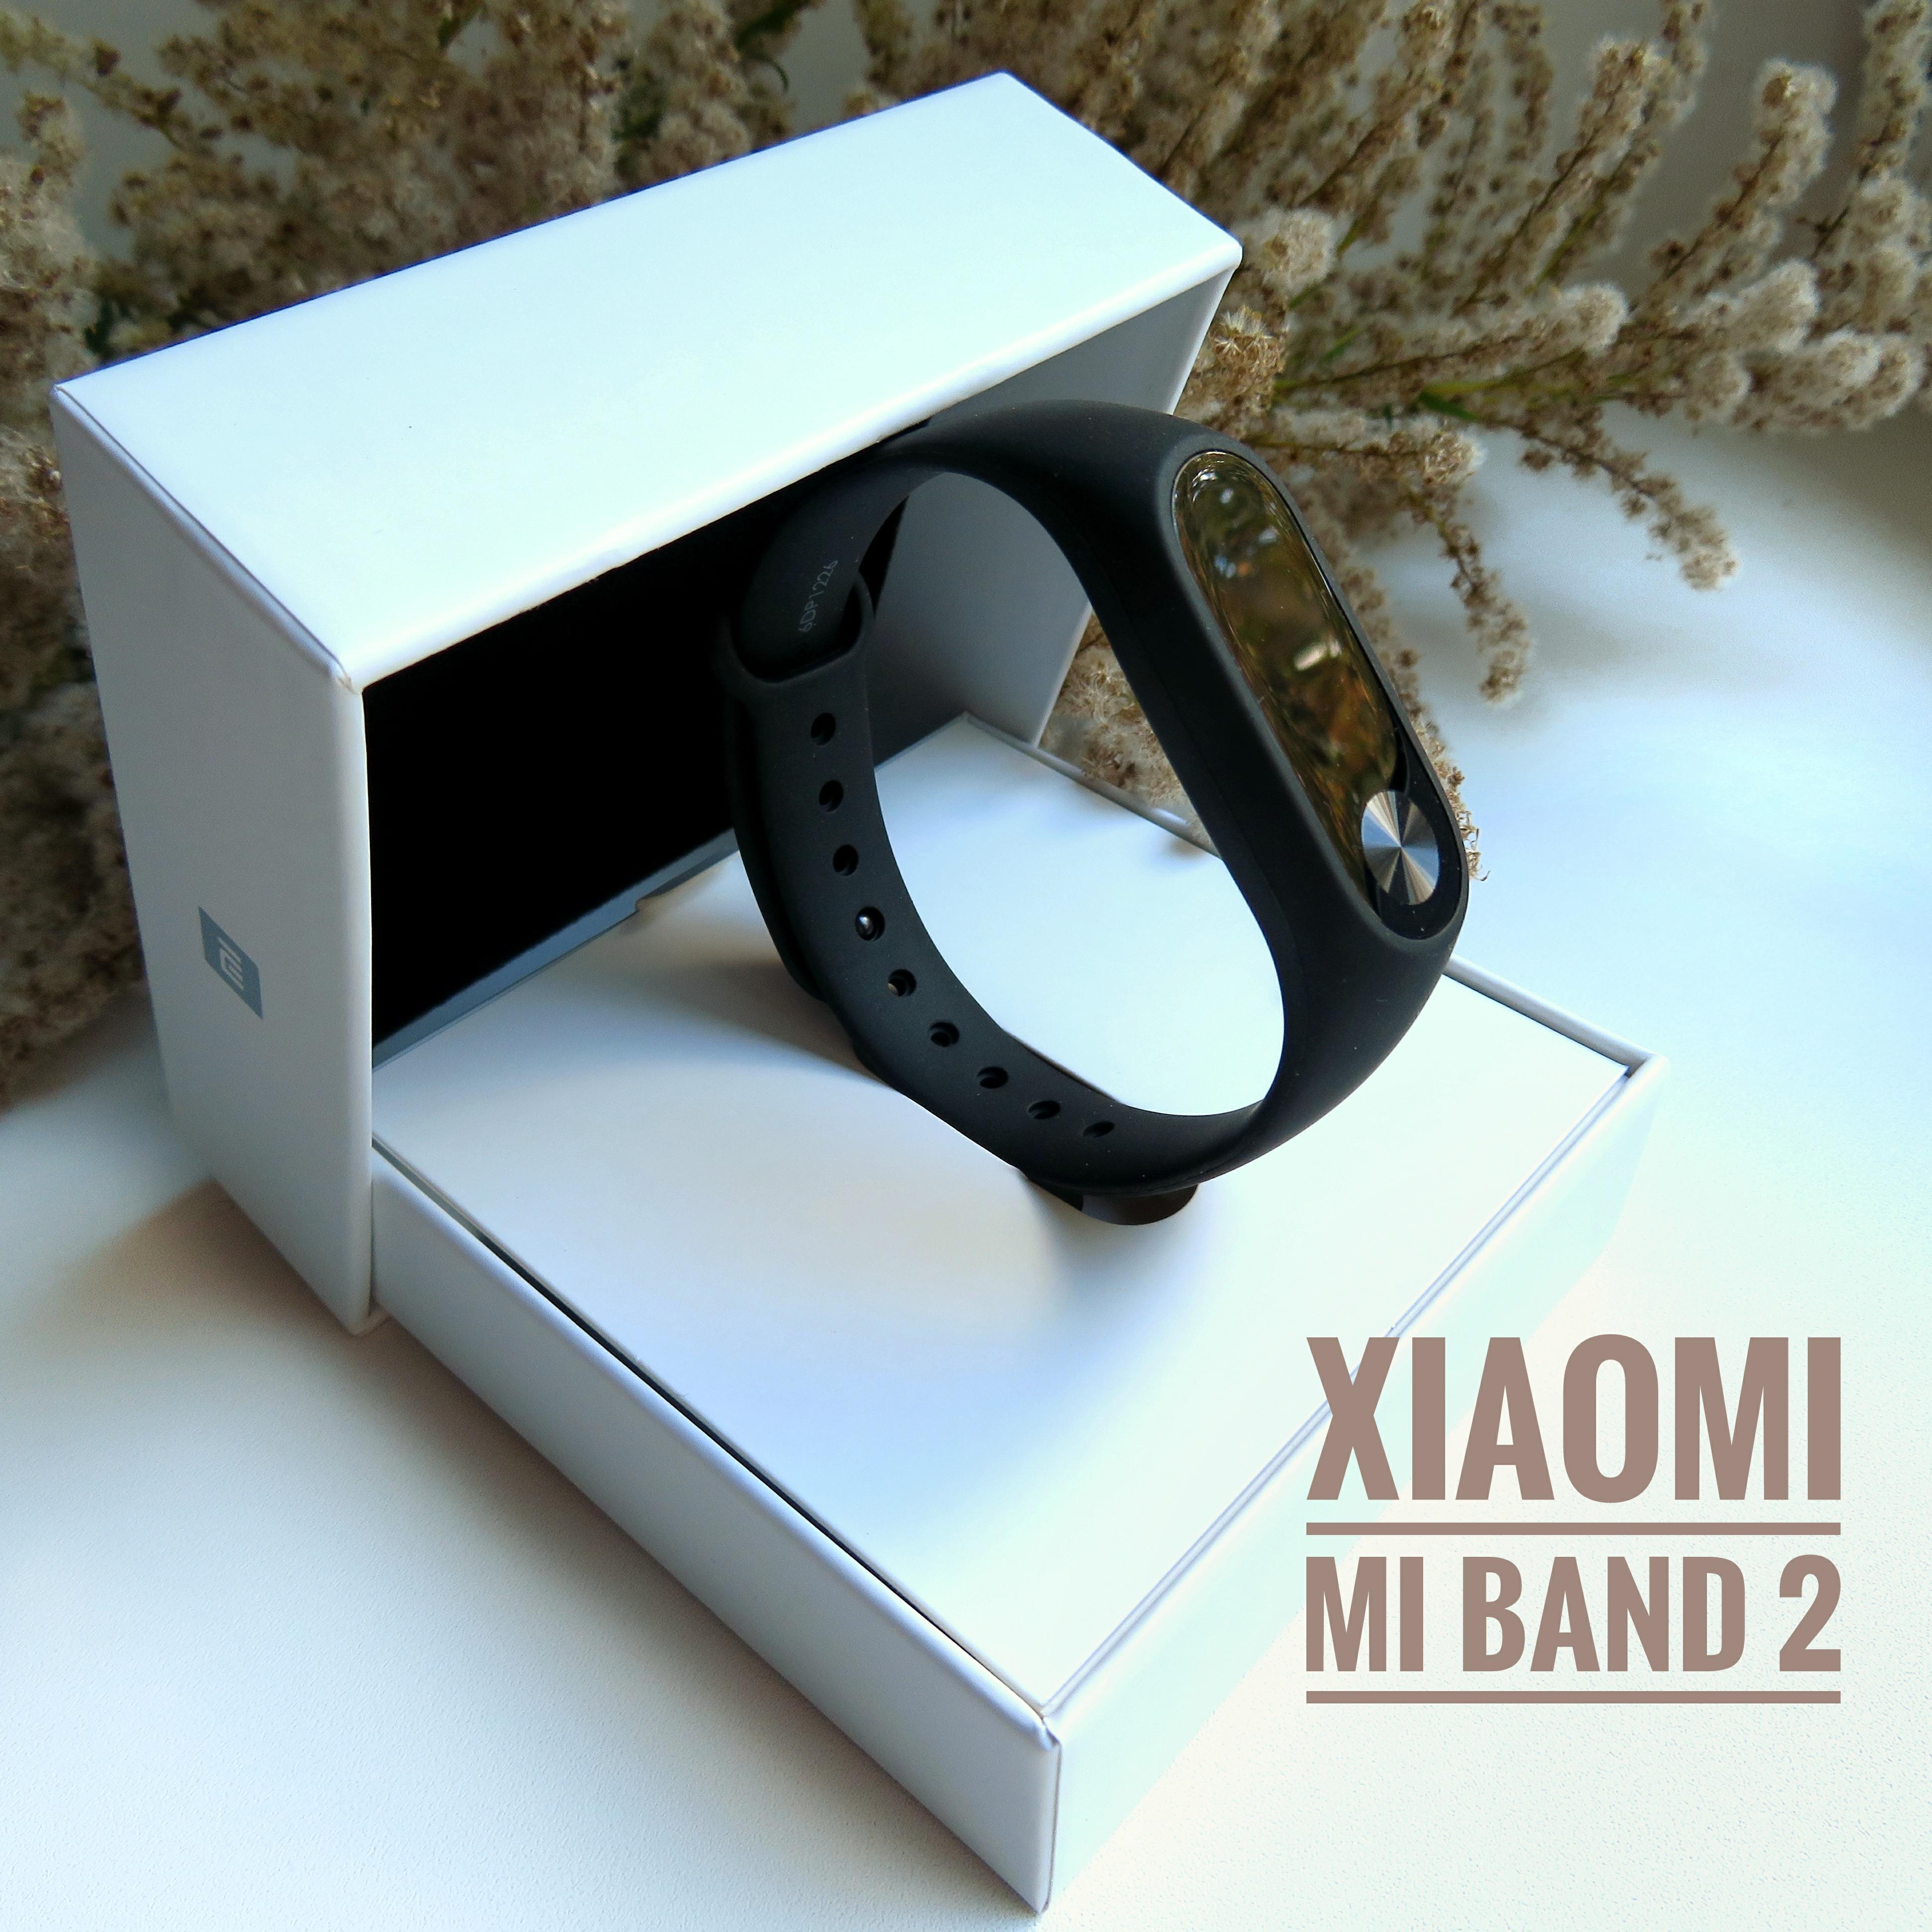 Водонепроницаемый фитнес браслет XIAOMI Mi BAND 2